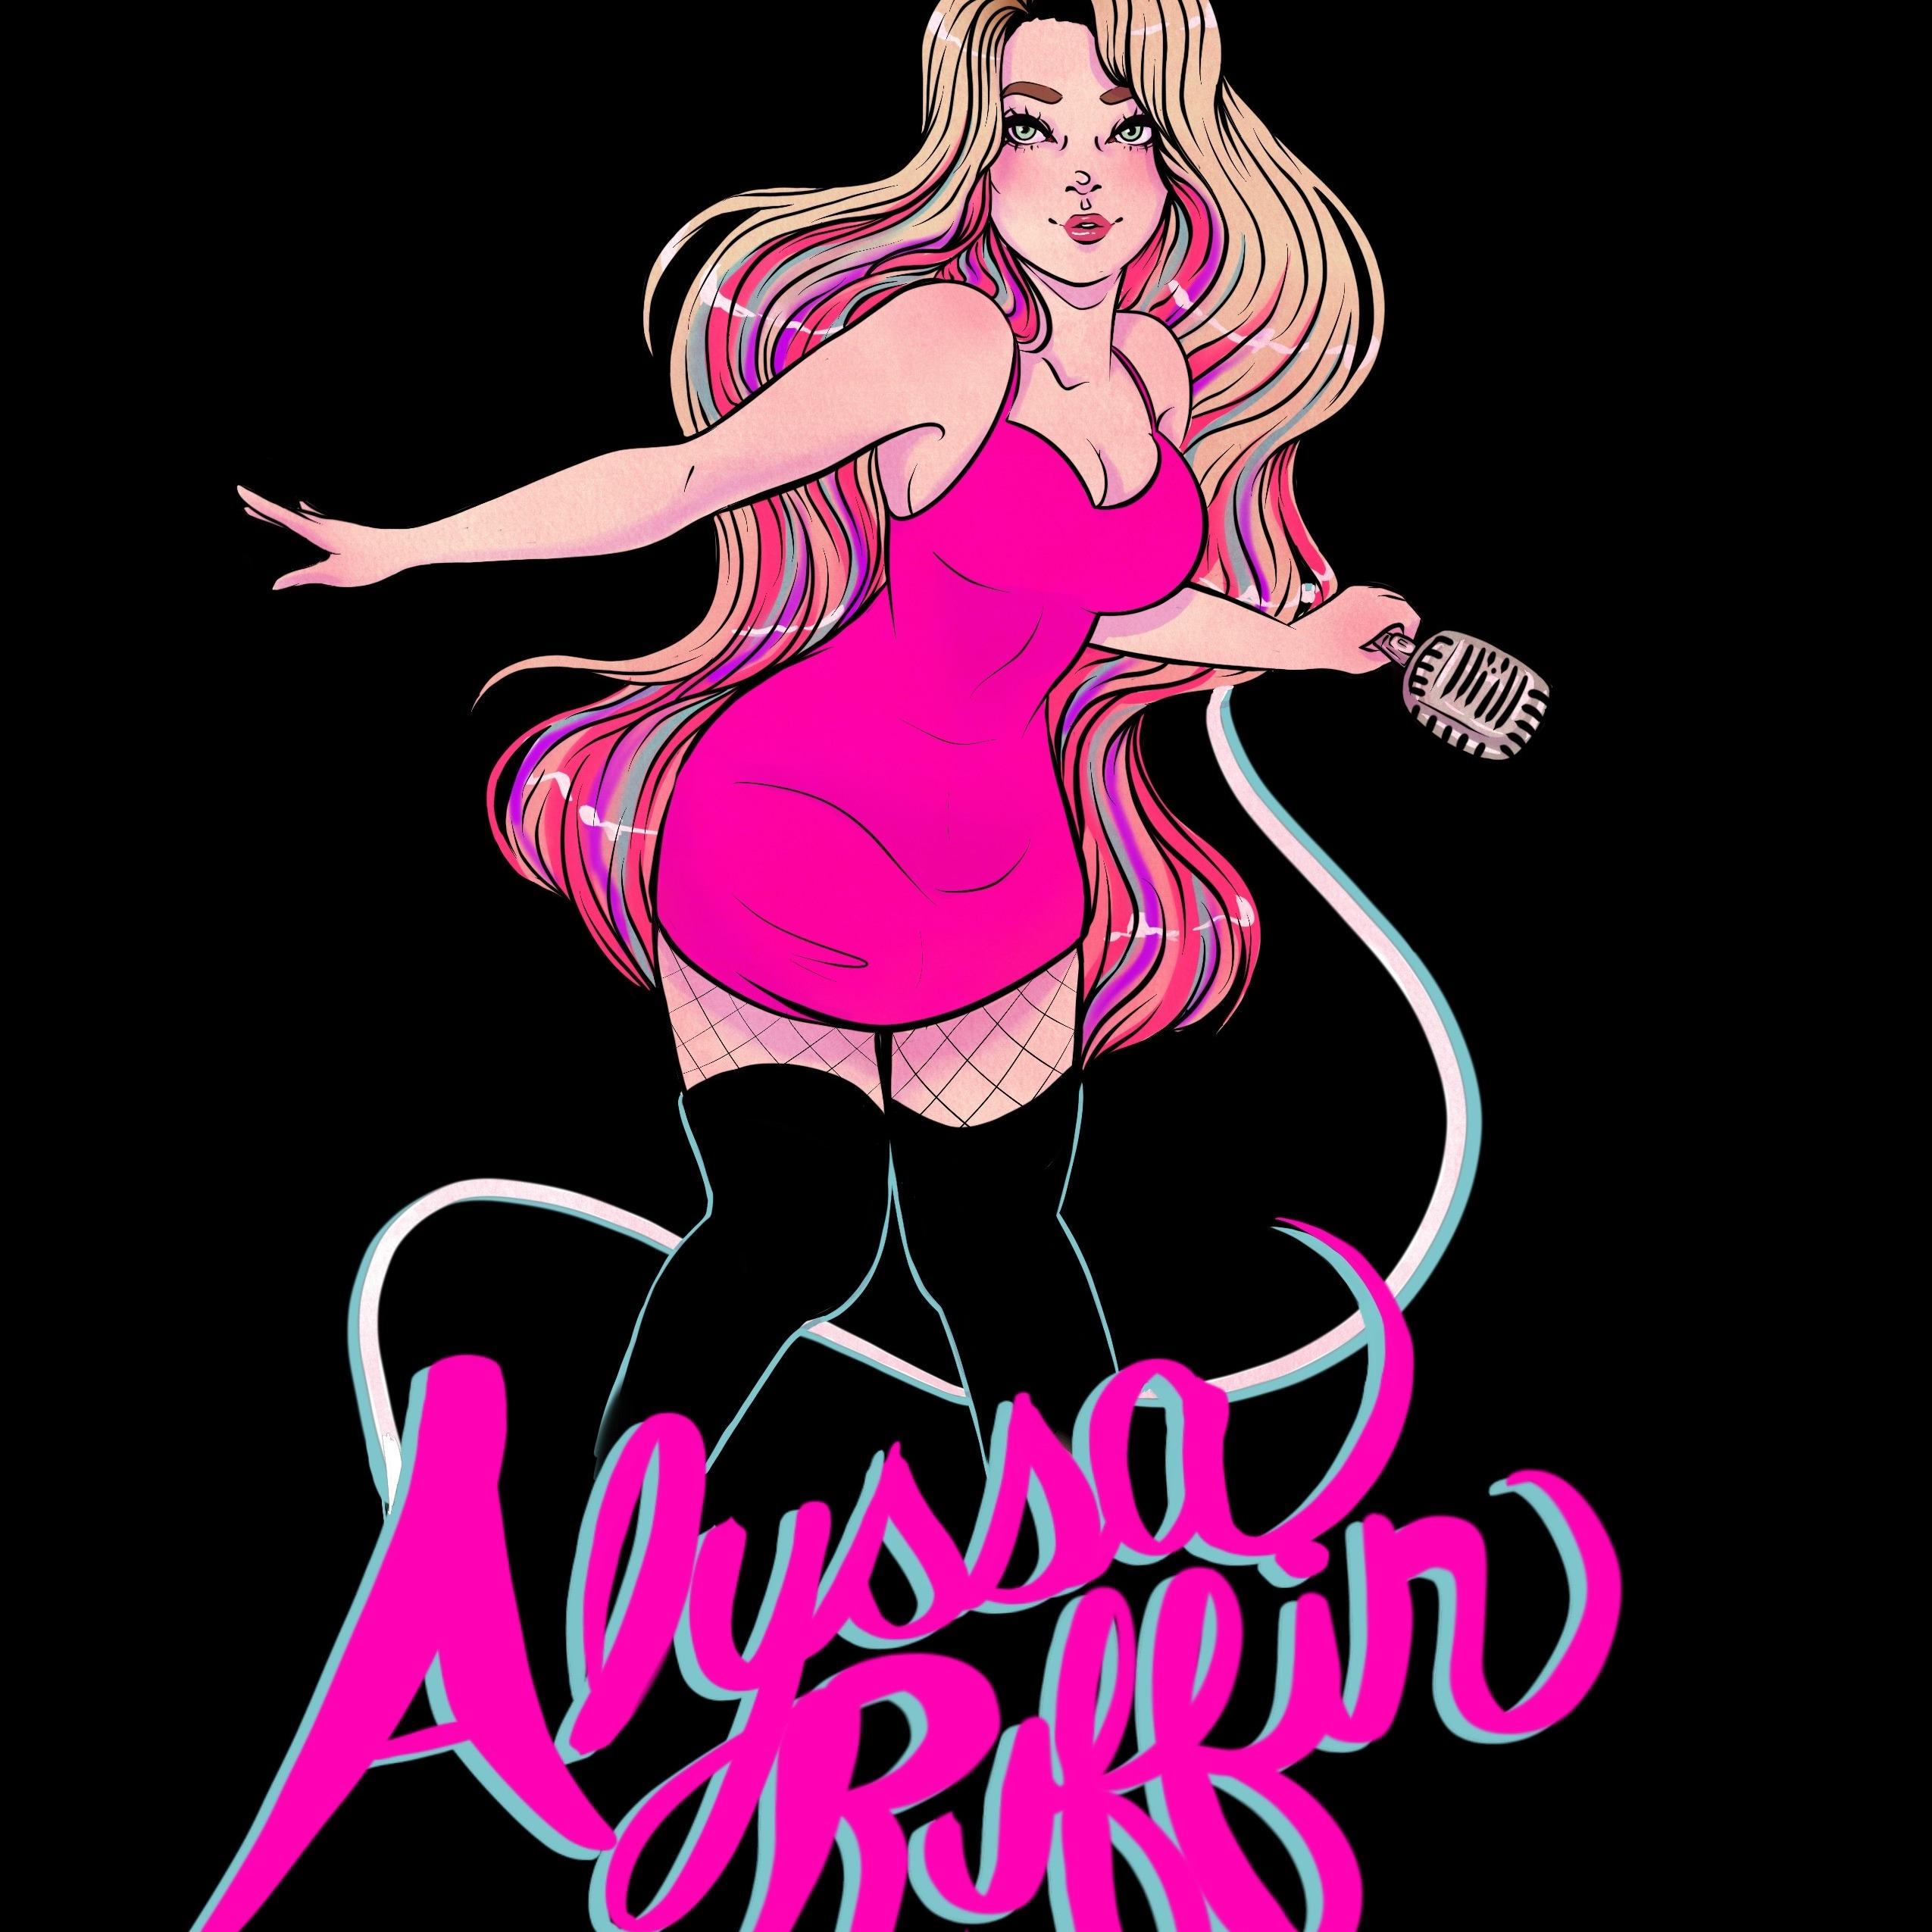 ALYSSA RUFFIN (Alyssaruffin) Profile Image | Linktree